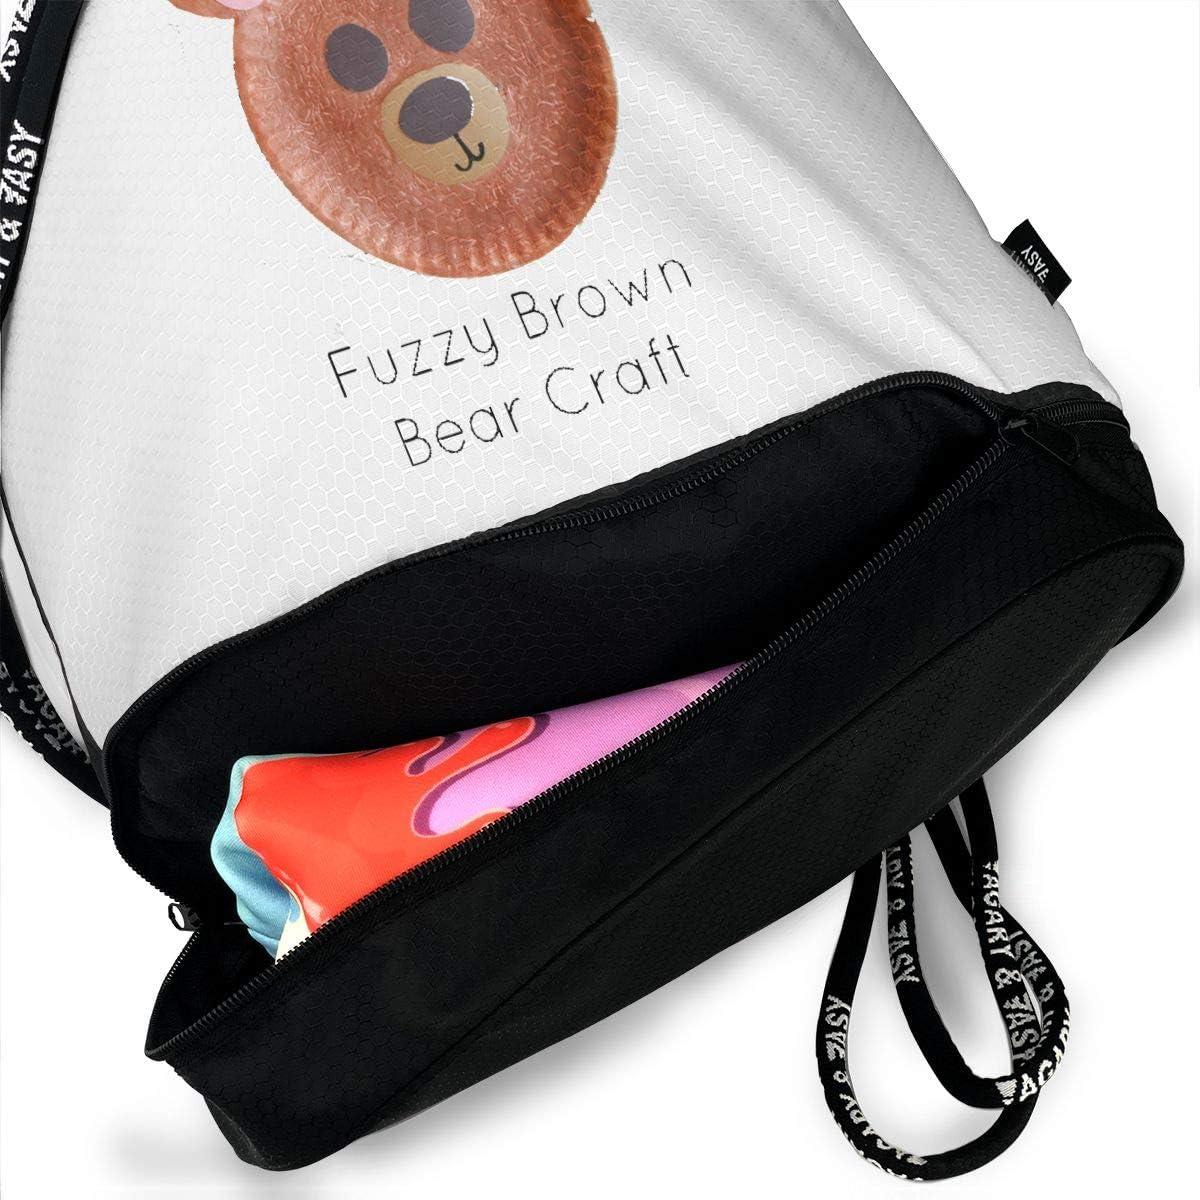 Brown Bear3 School Travel Laptop Bookbags Beam Mouth Sports Sackpack Rucksack Shoulder Bags For Men /& Women